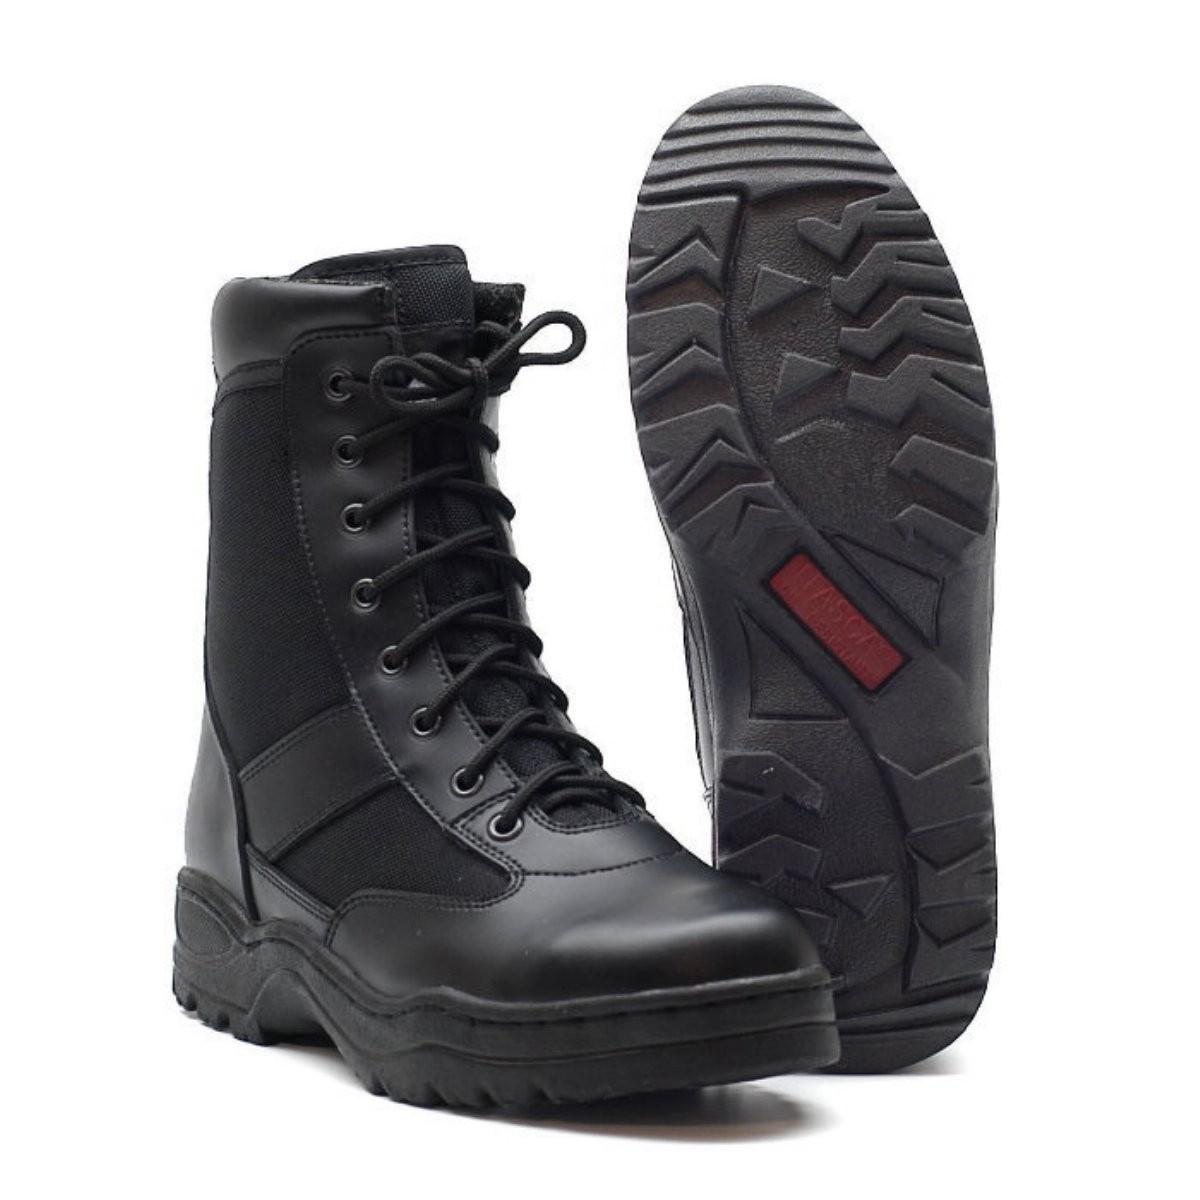 McAllister Outdoor Boots Farbe Schwarz Größe 45 5PdoVe